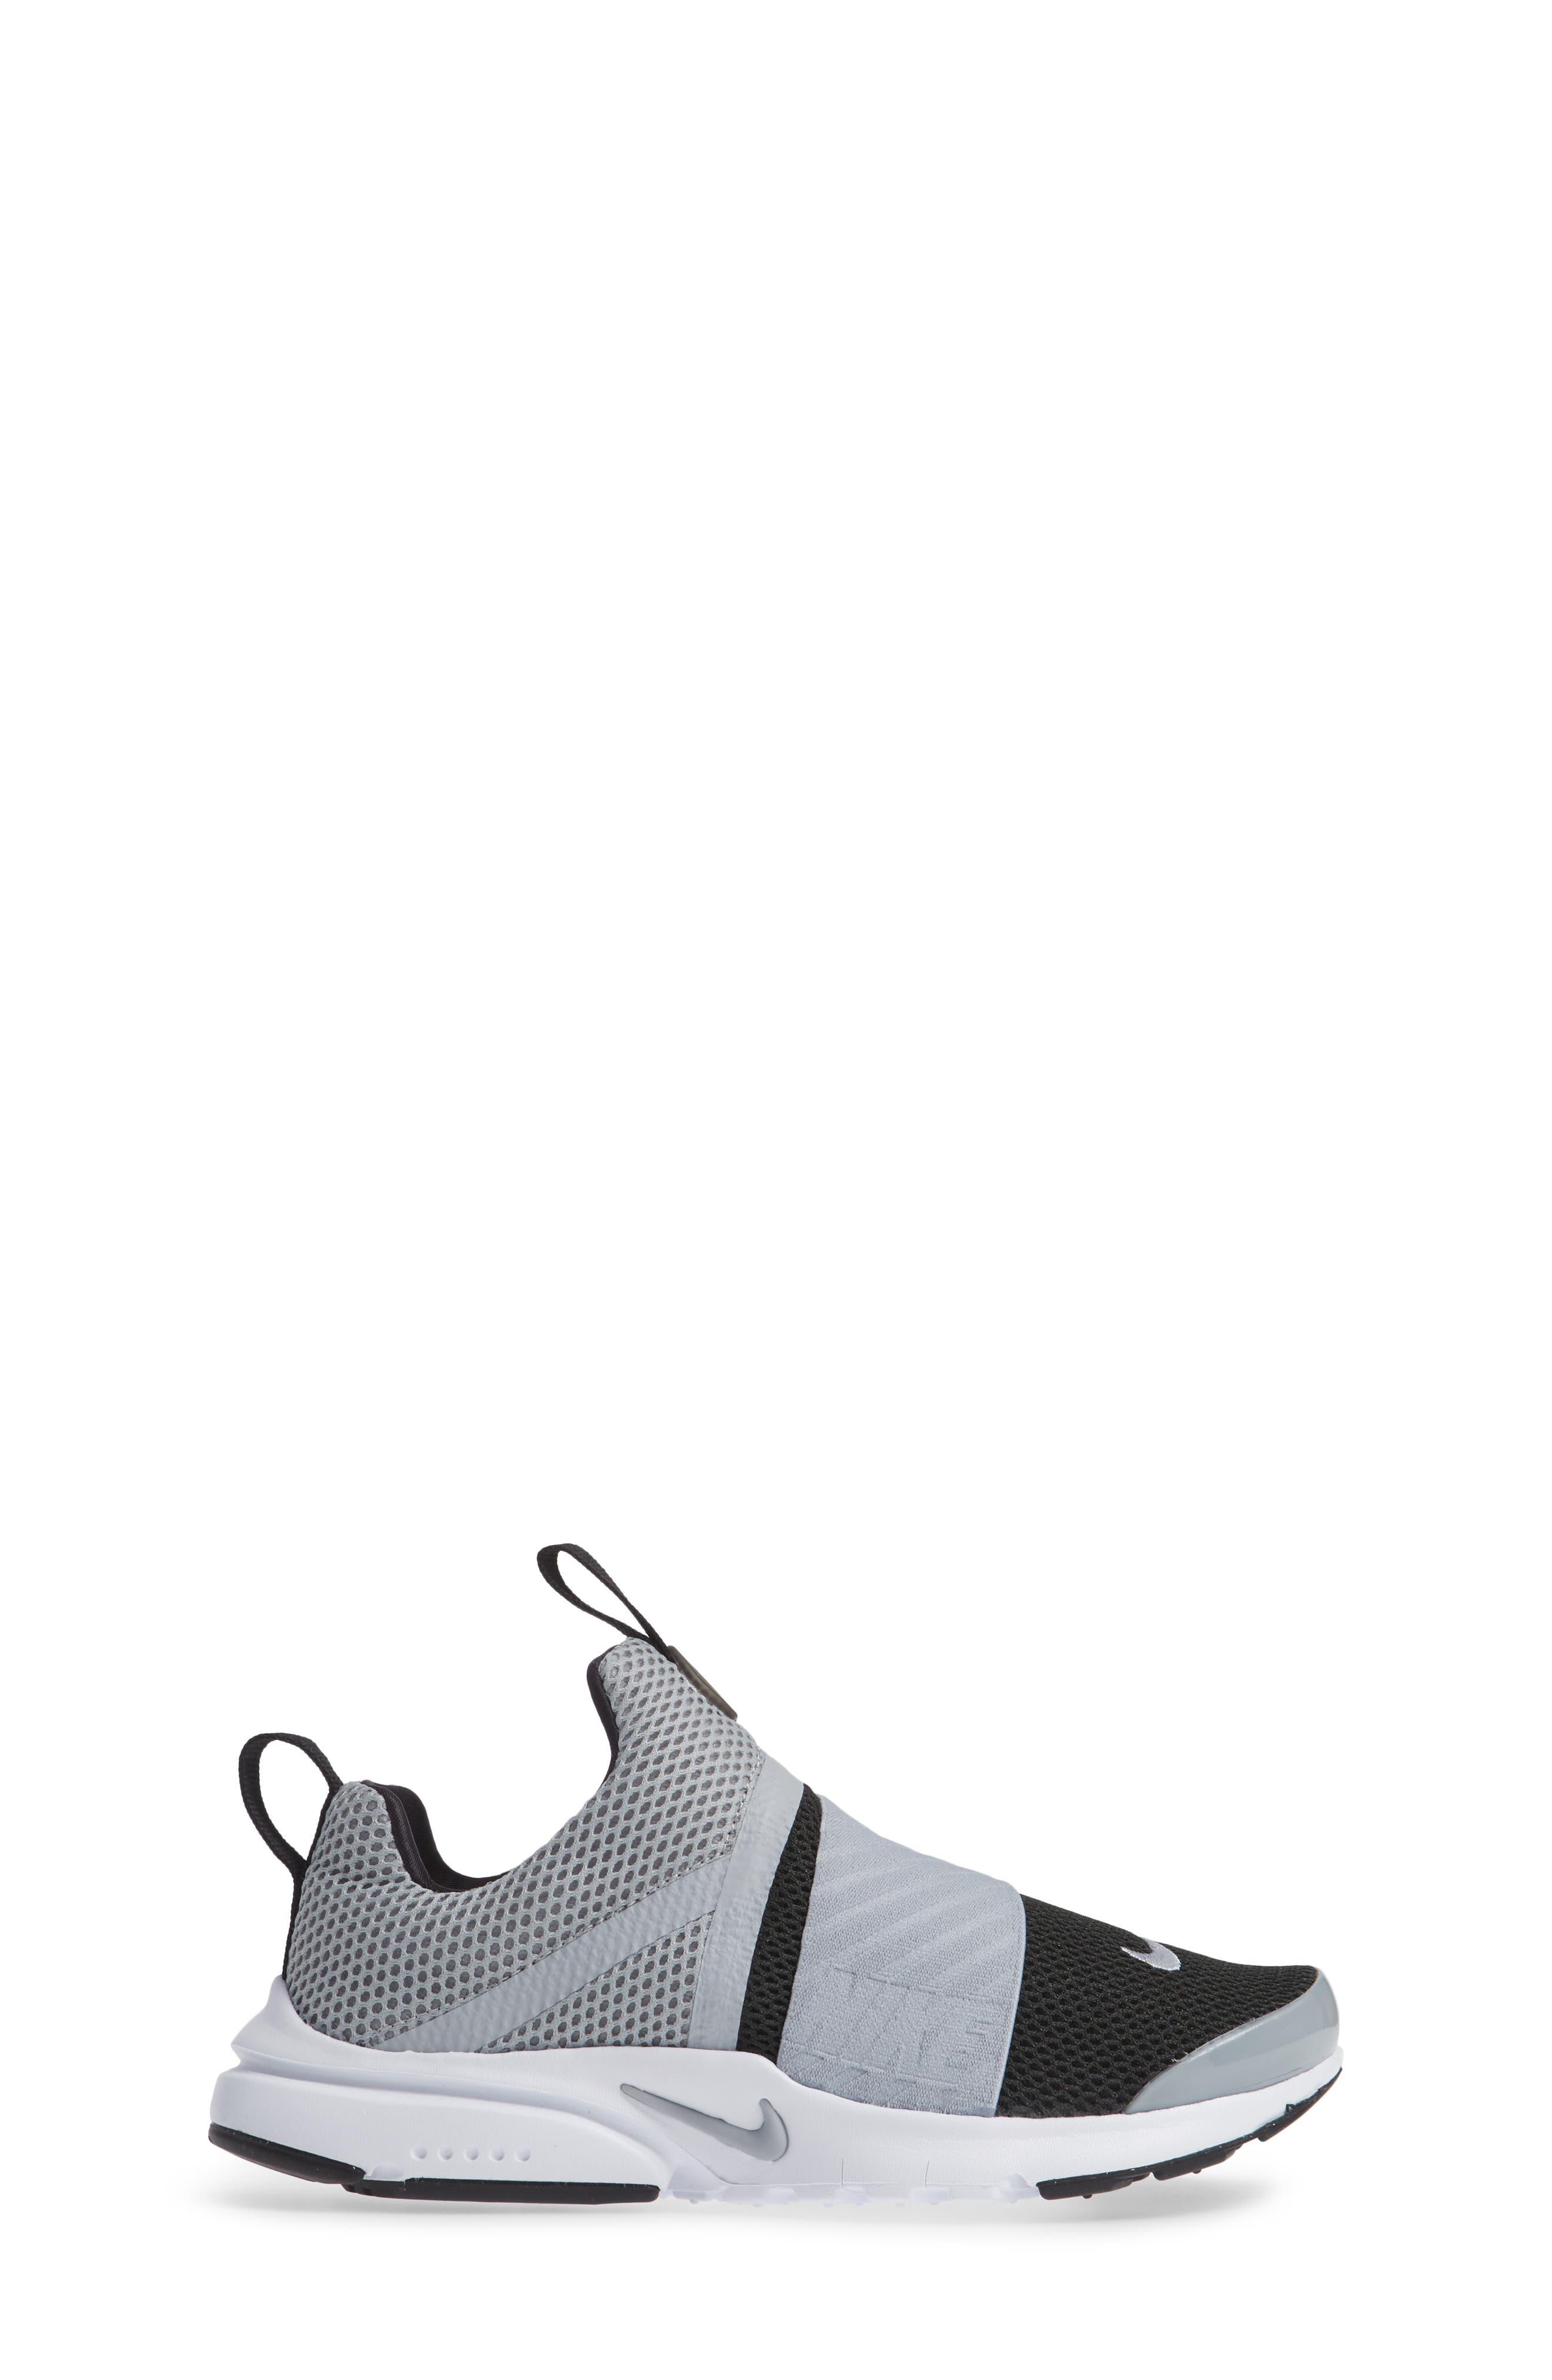 Presto Extreme Sneaker,                             Alternate thumbnail 25, color,